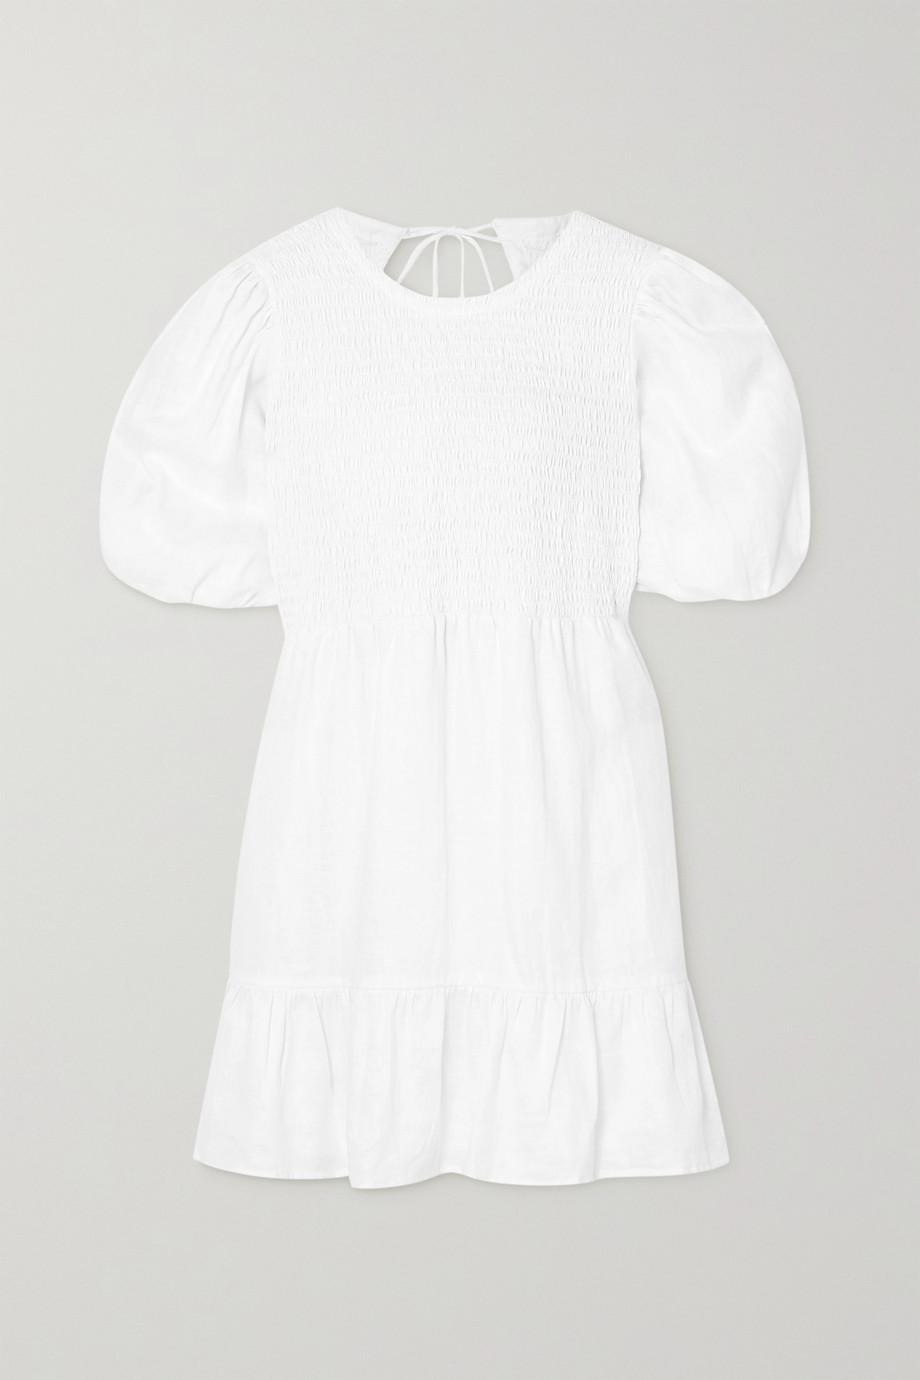 Faithfull The Brand + NET SUSTAIN Lorica open-back shirred linen mini dress